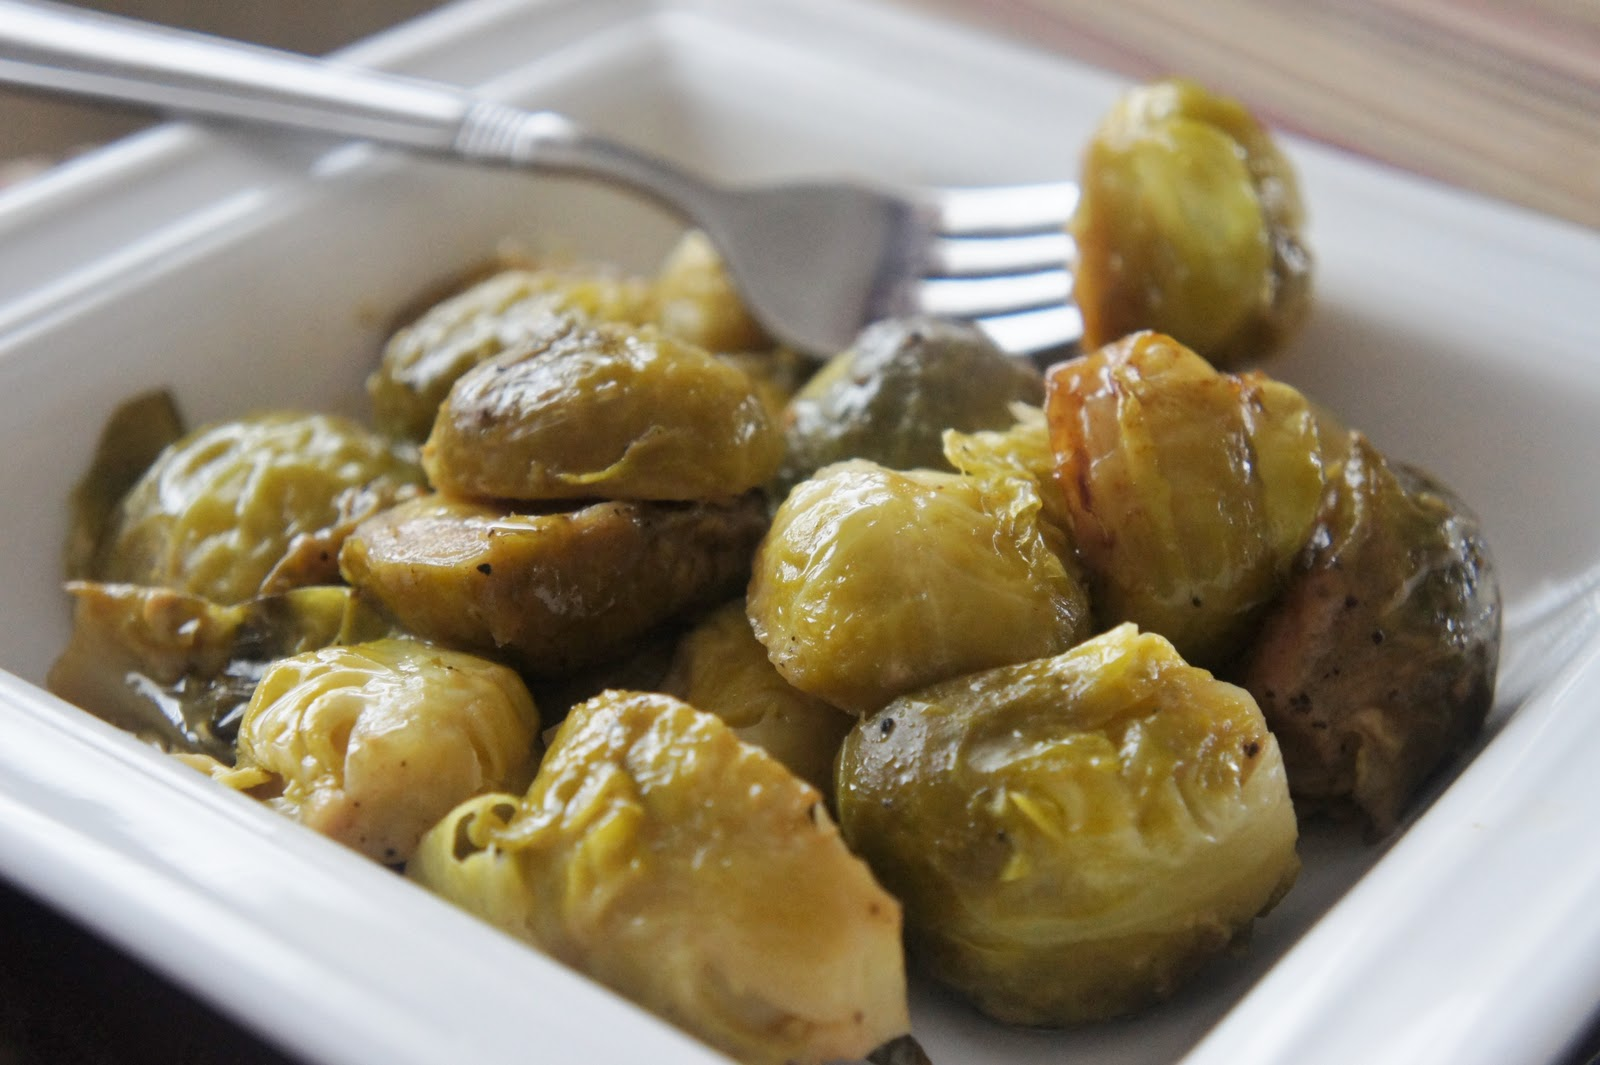 Crock Pot Dijon Mustard Brussel Sprouts